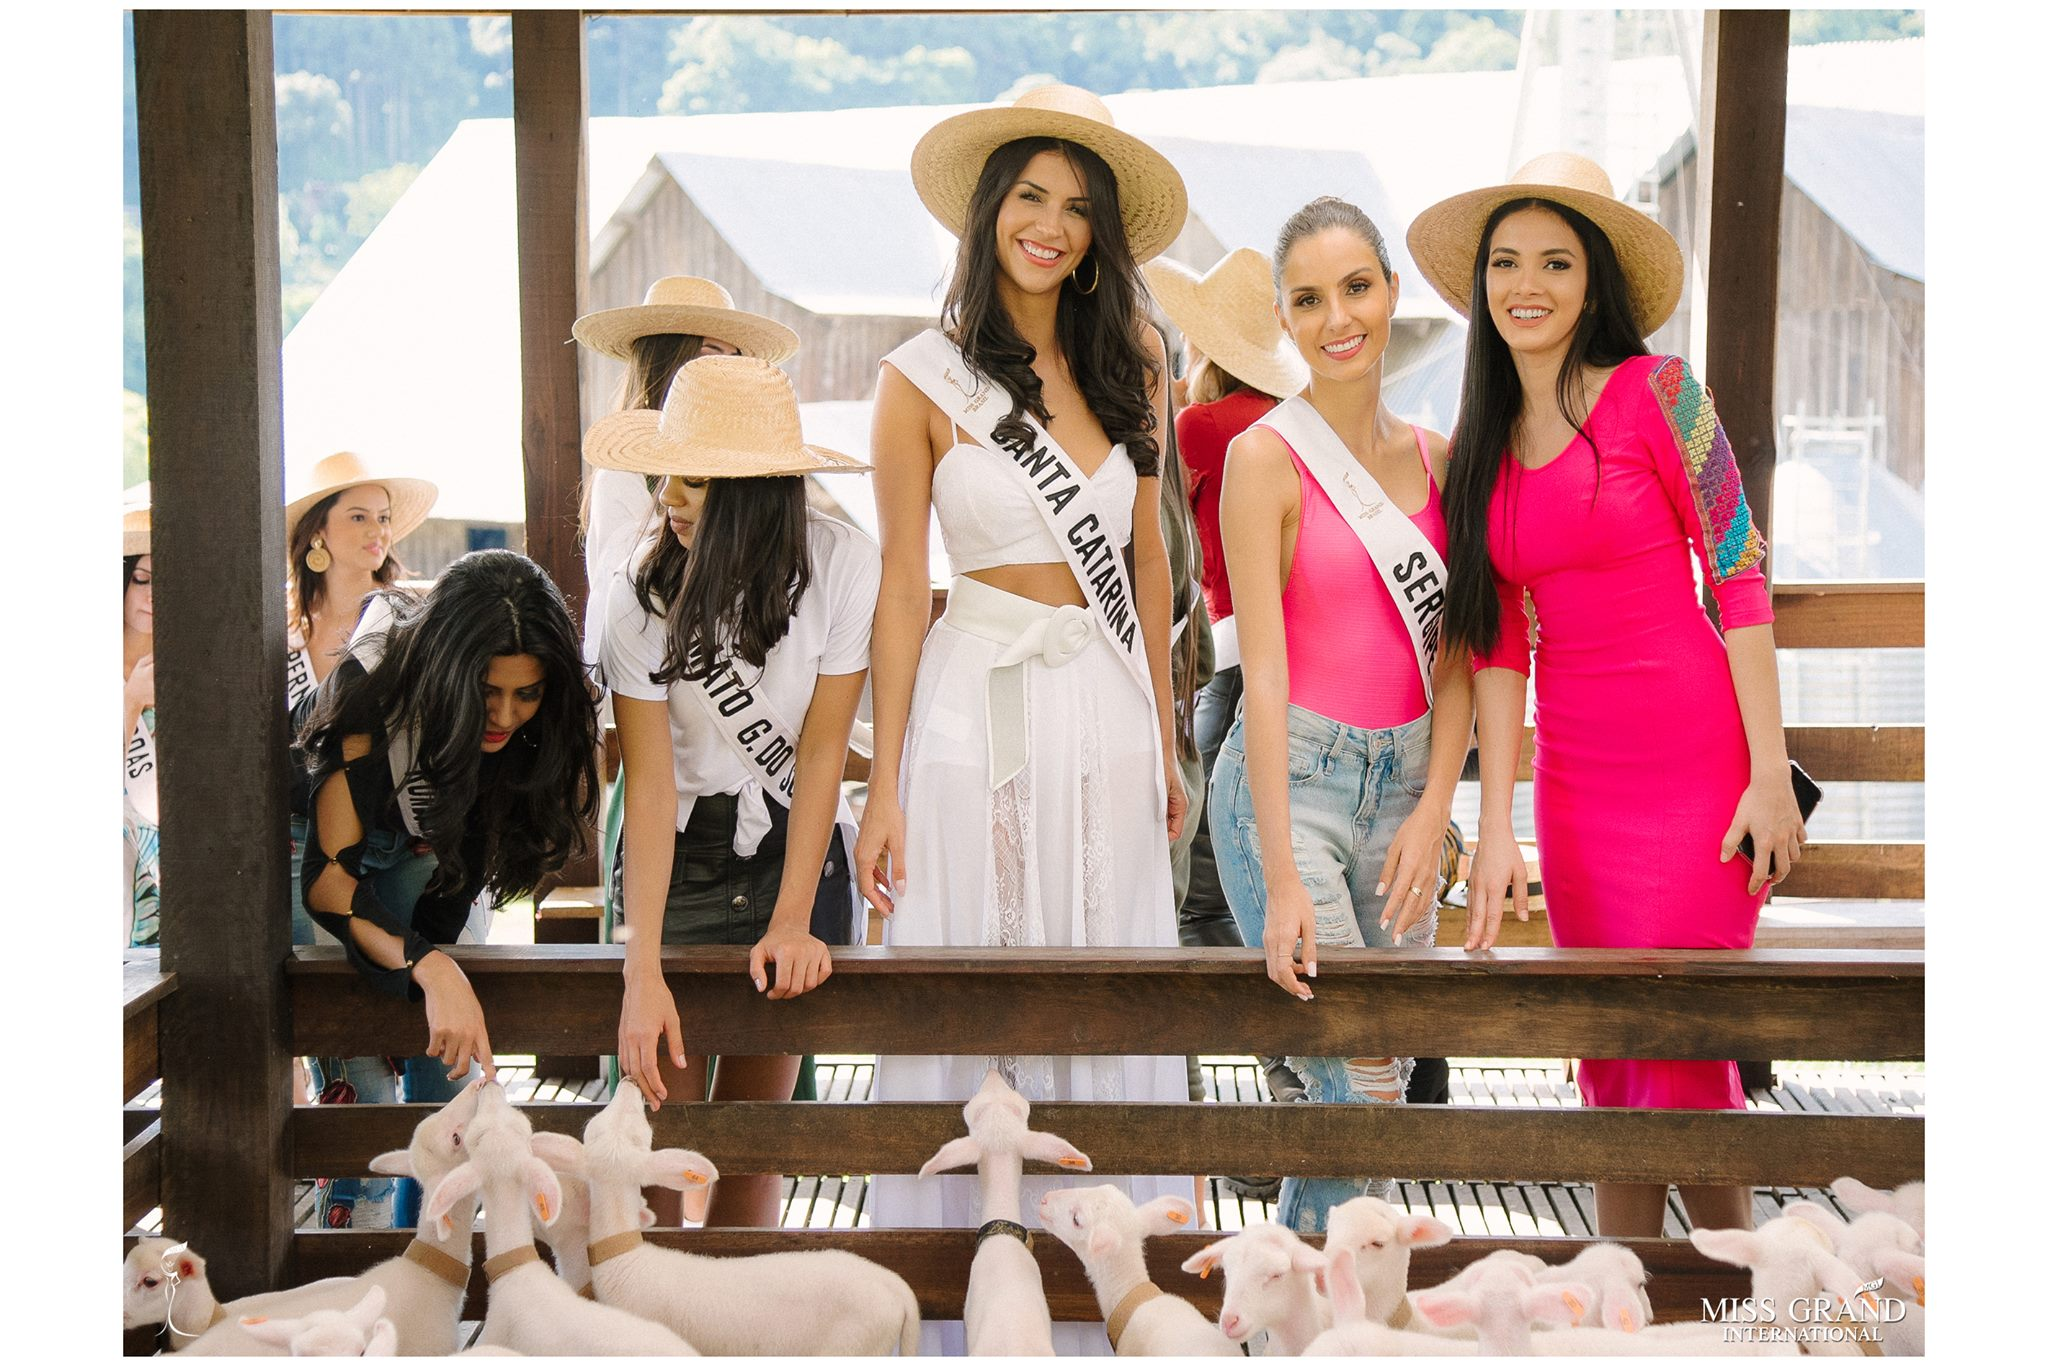 miss grand international 2018 visitando brasil para assistir a final de miss grand brasil 2019. - Página 3 Alex-p73